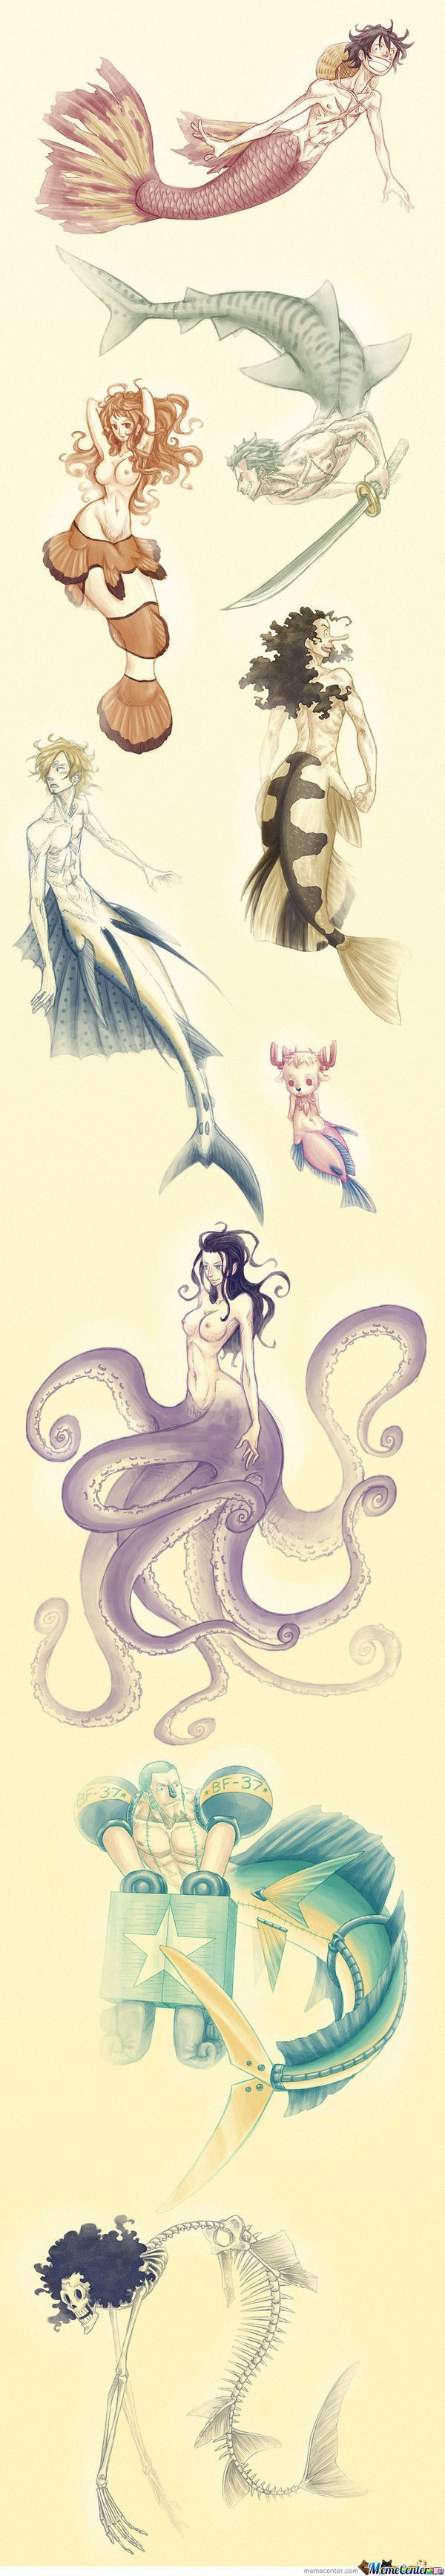 one piece mermaid